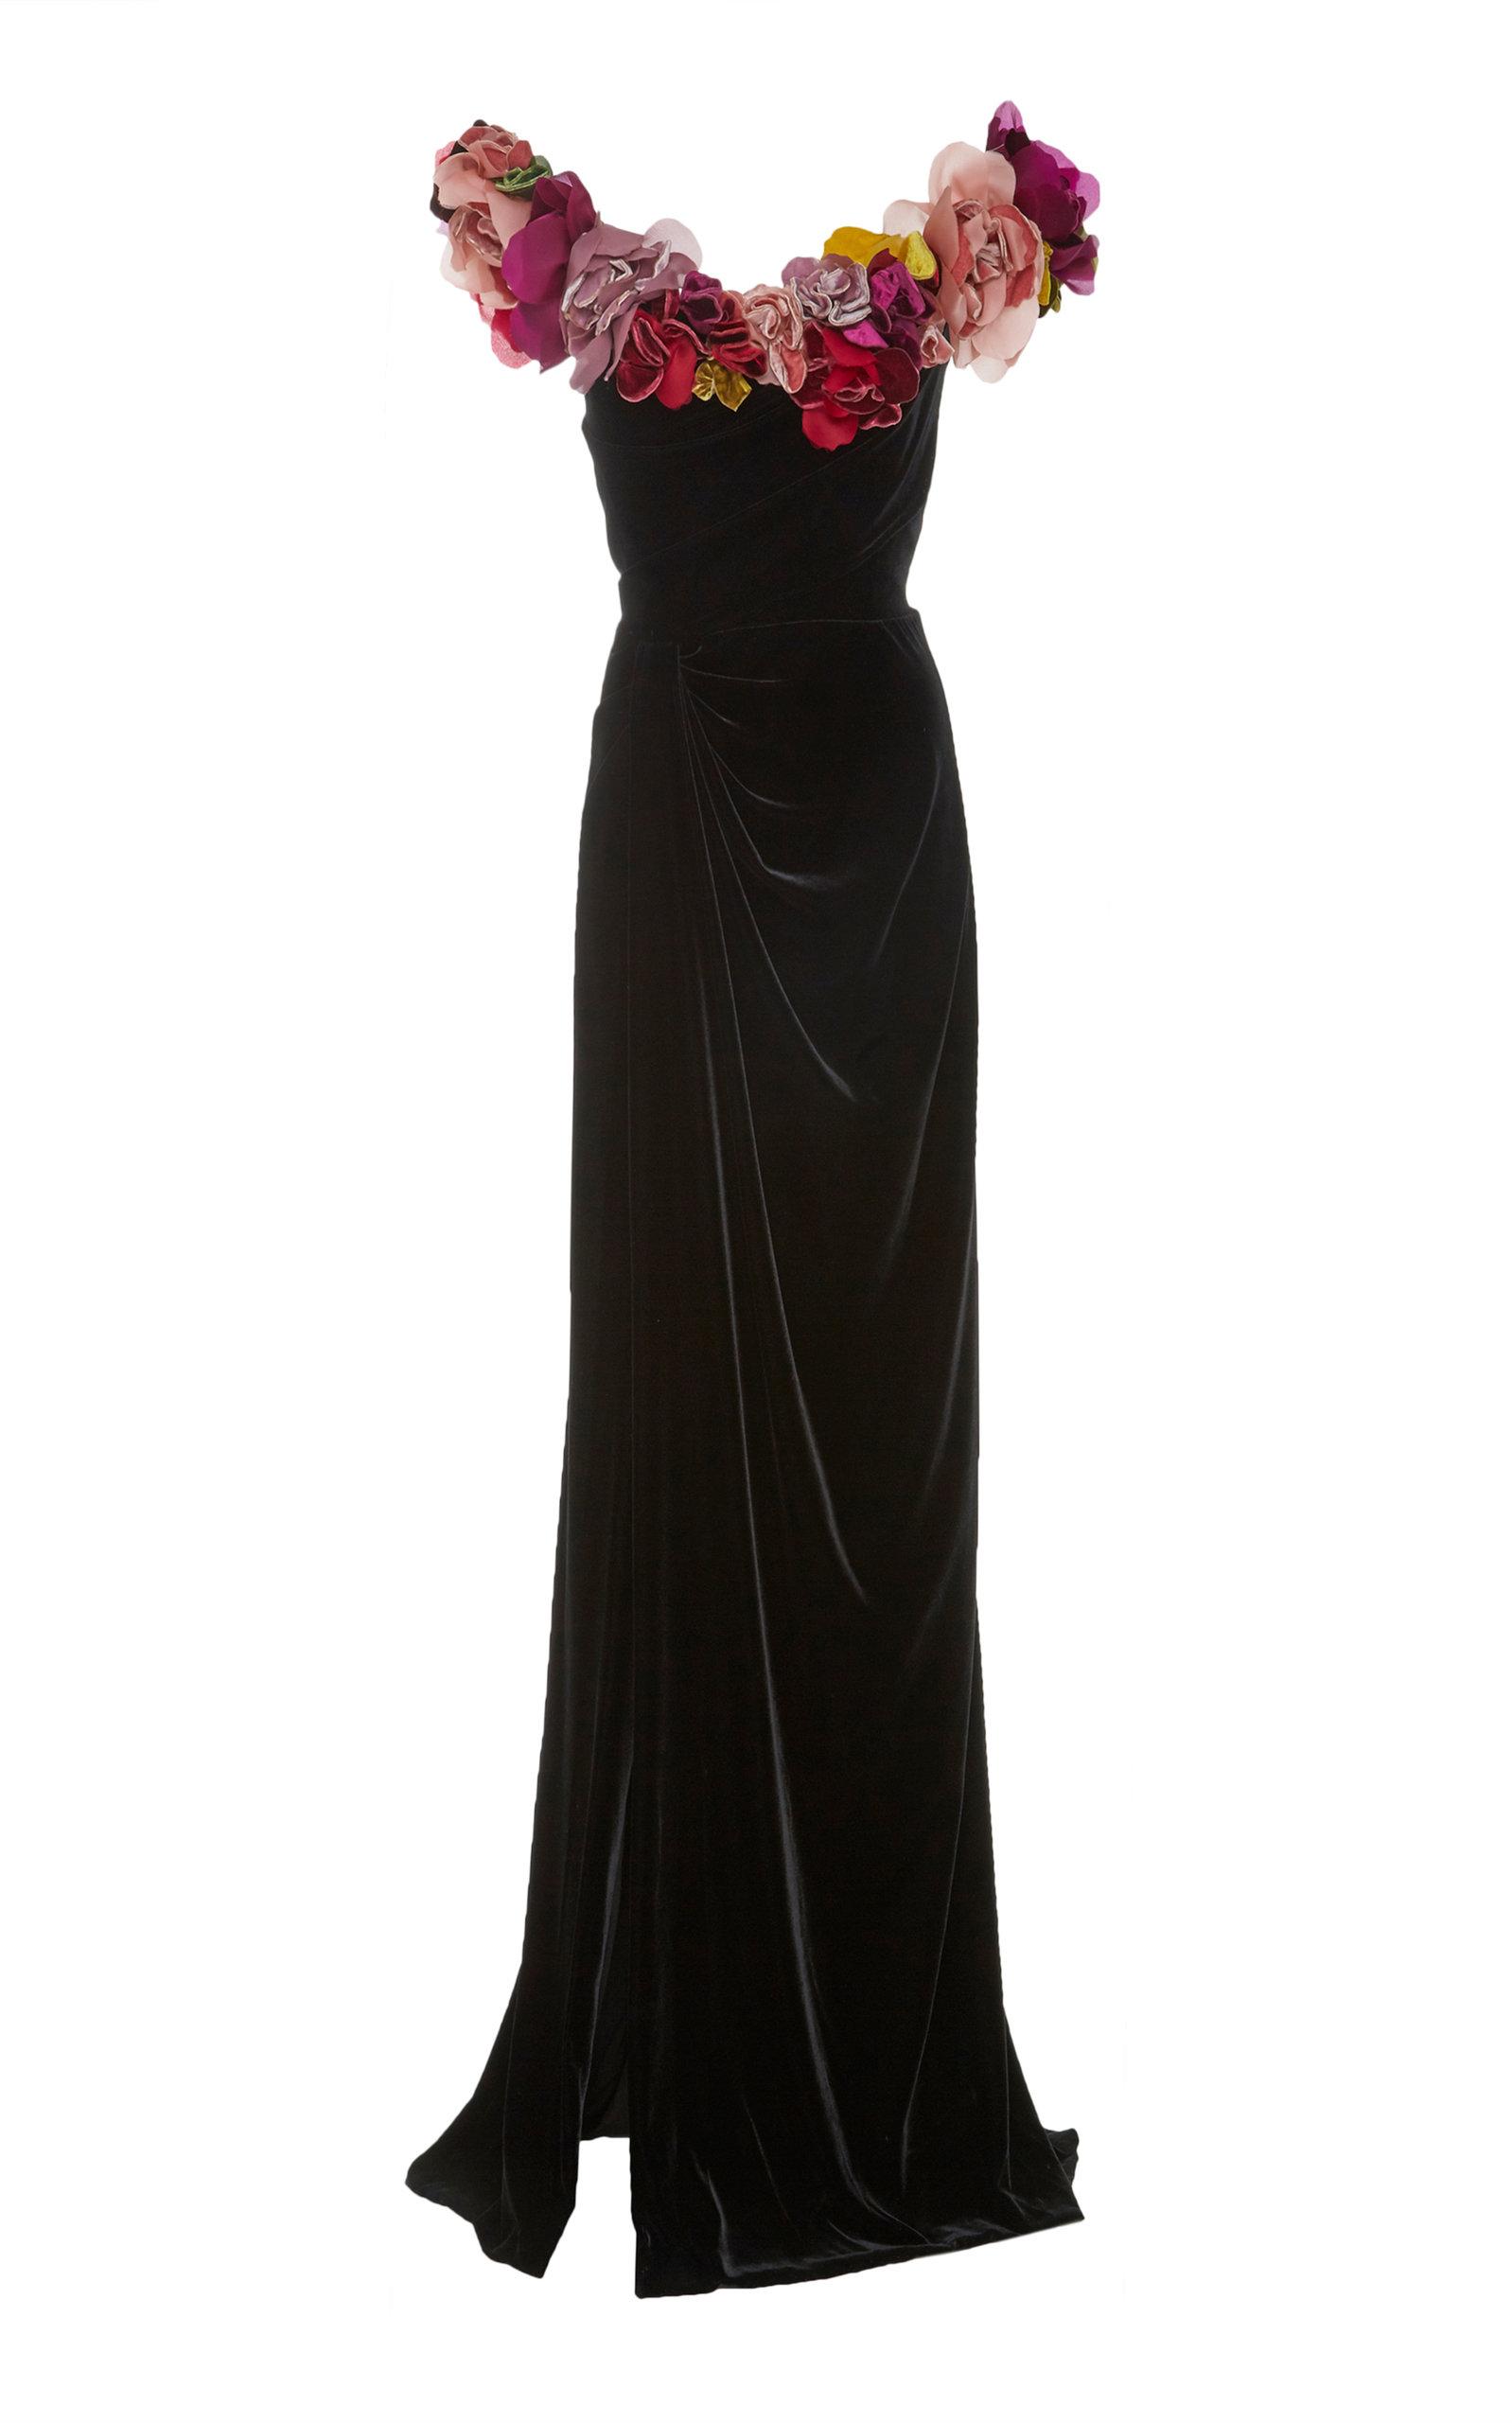 Off-The-Shoulder 3-D Flower Corsage Velvet Column Evening Gown, Black from District 5 Boutique